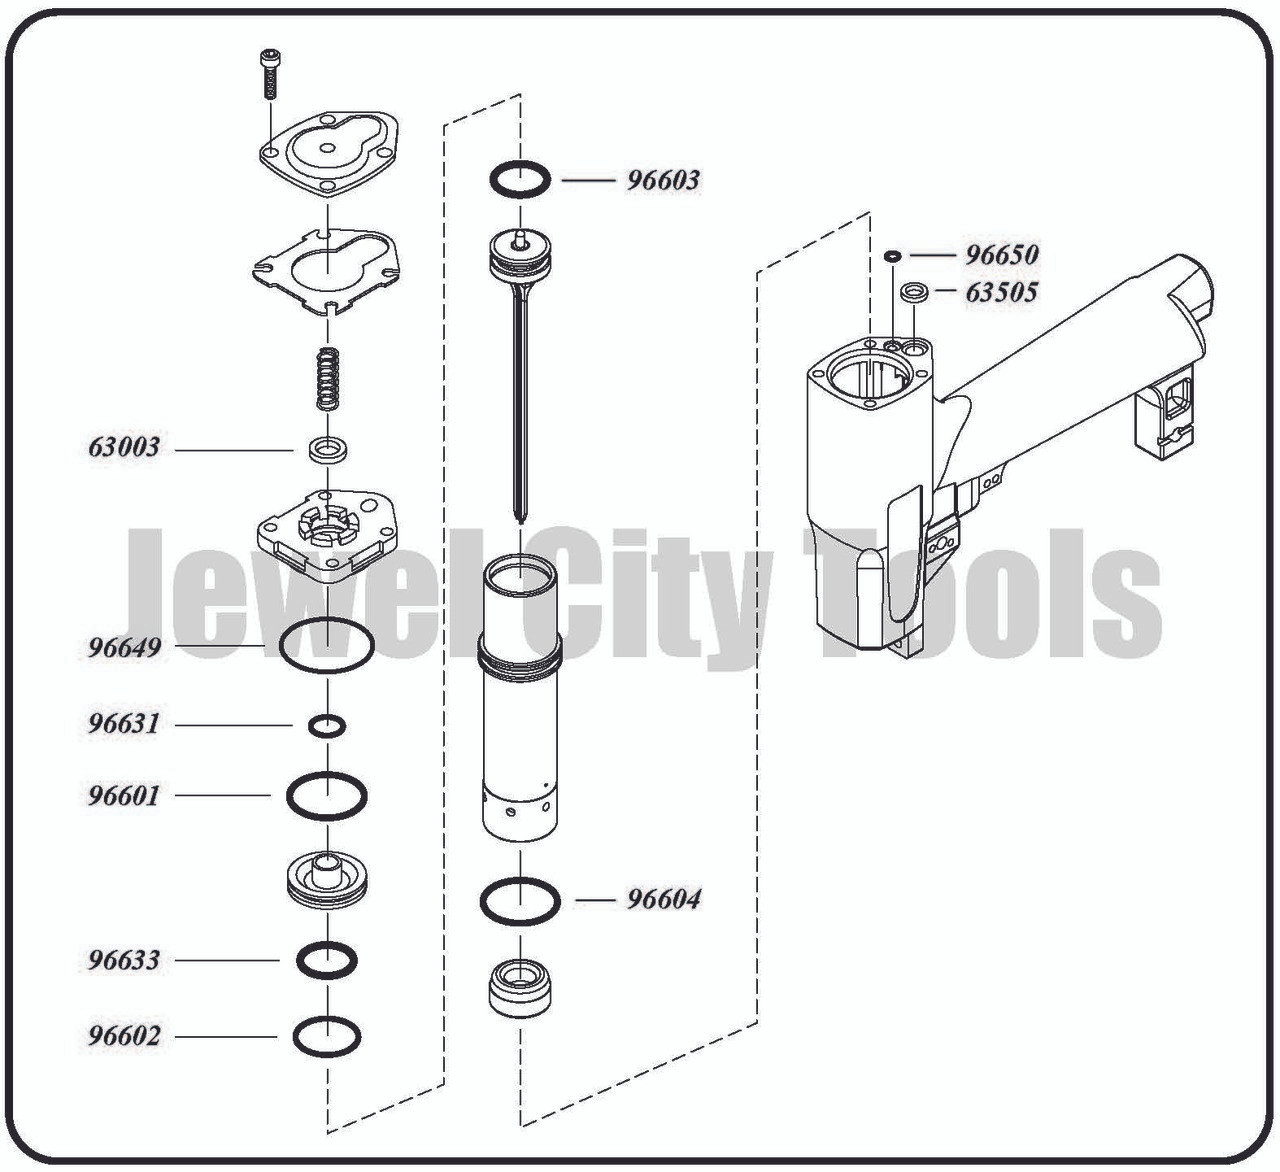 Grex P650LX, P650LXE H850LX Pinner Nailer OEM Original O-Ring Kit--Part # H850LXKD